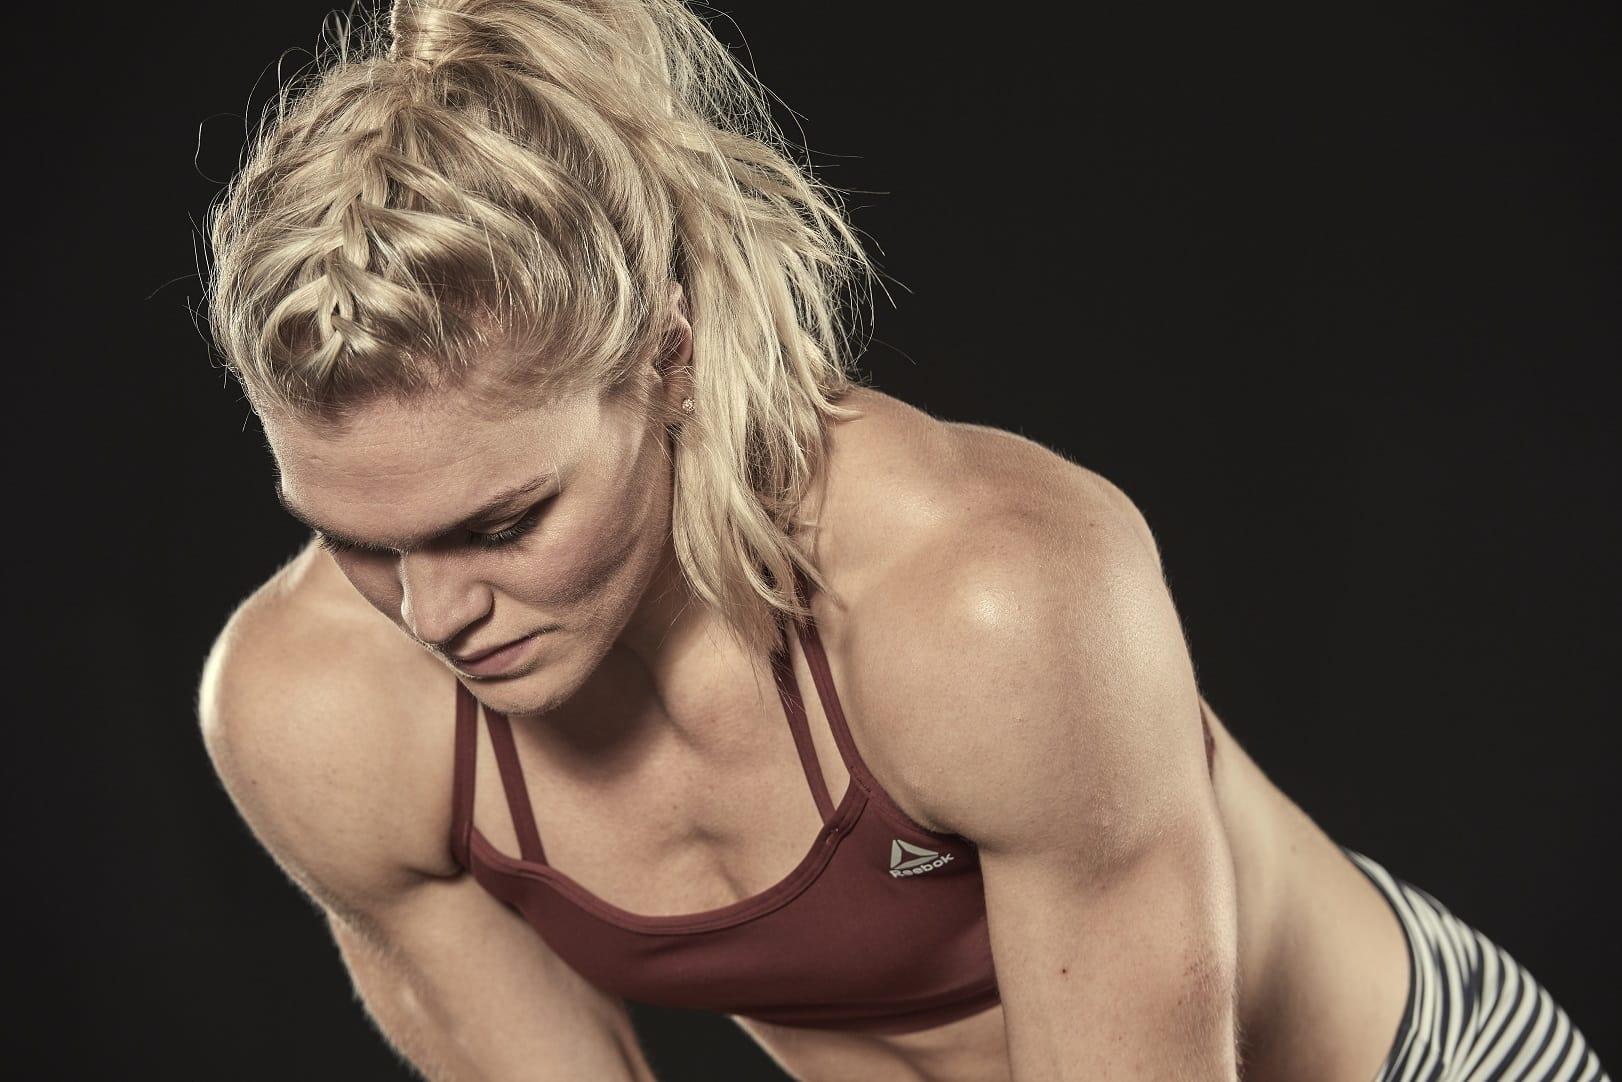 workout-hair-handstand-pushups